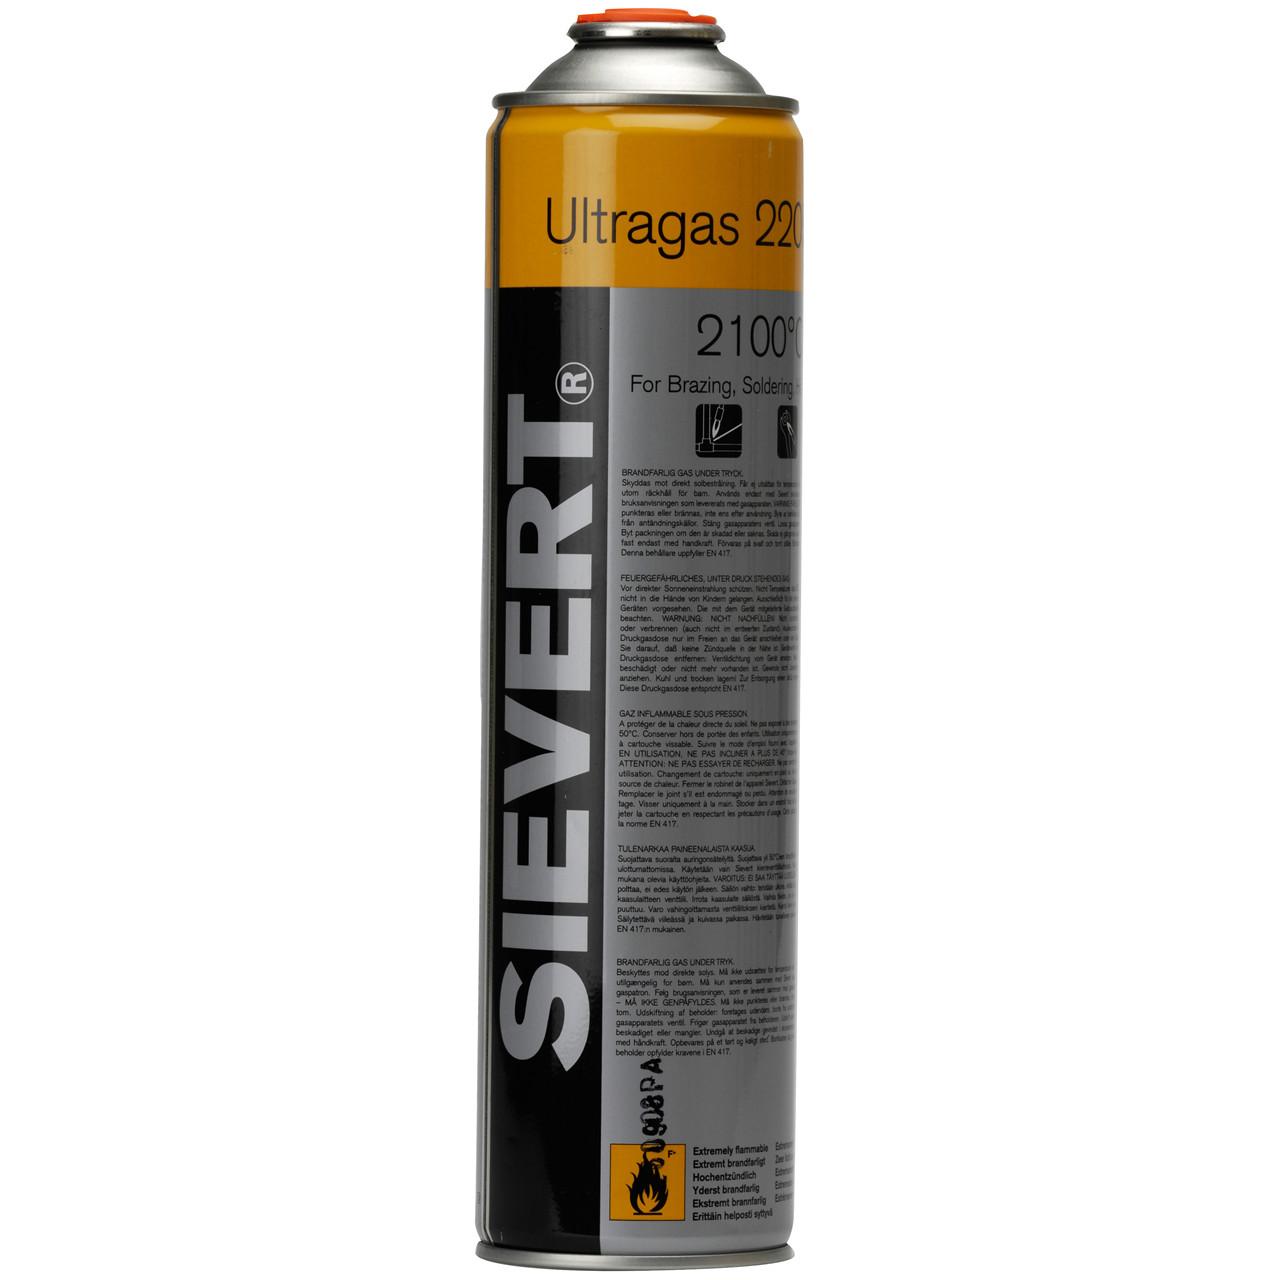 SIEVERT Gasdåse Ultragas 2205 210g/380ml - Værktøj -> Håndværktøj -> Gas og loddeværktøj -> Gasdåser|Værktøj -> Håndværktøj -> Gas og loddeværktøj|Værktøj -> Håndværktøj|Mærker -> Sievert